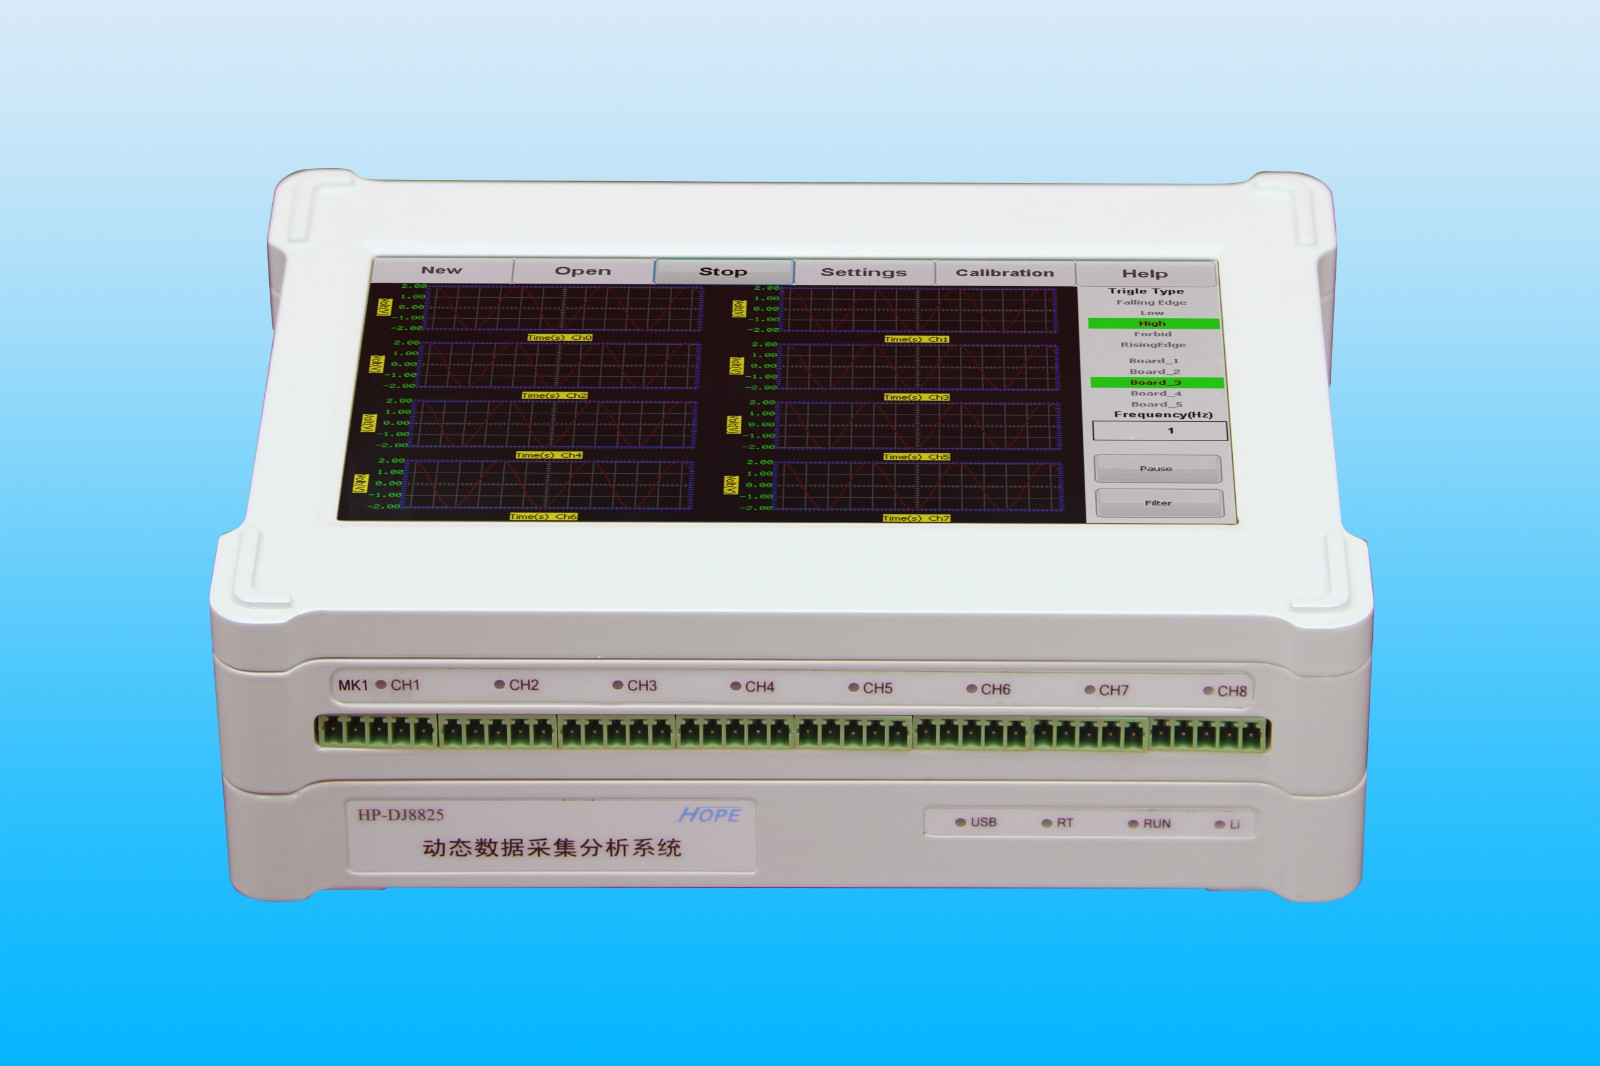 HP-DJ8125M 动态信号测试分析系统